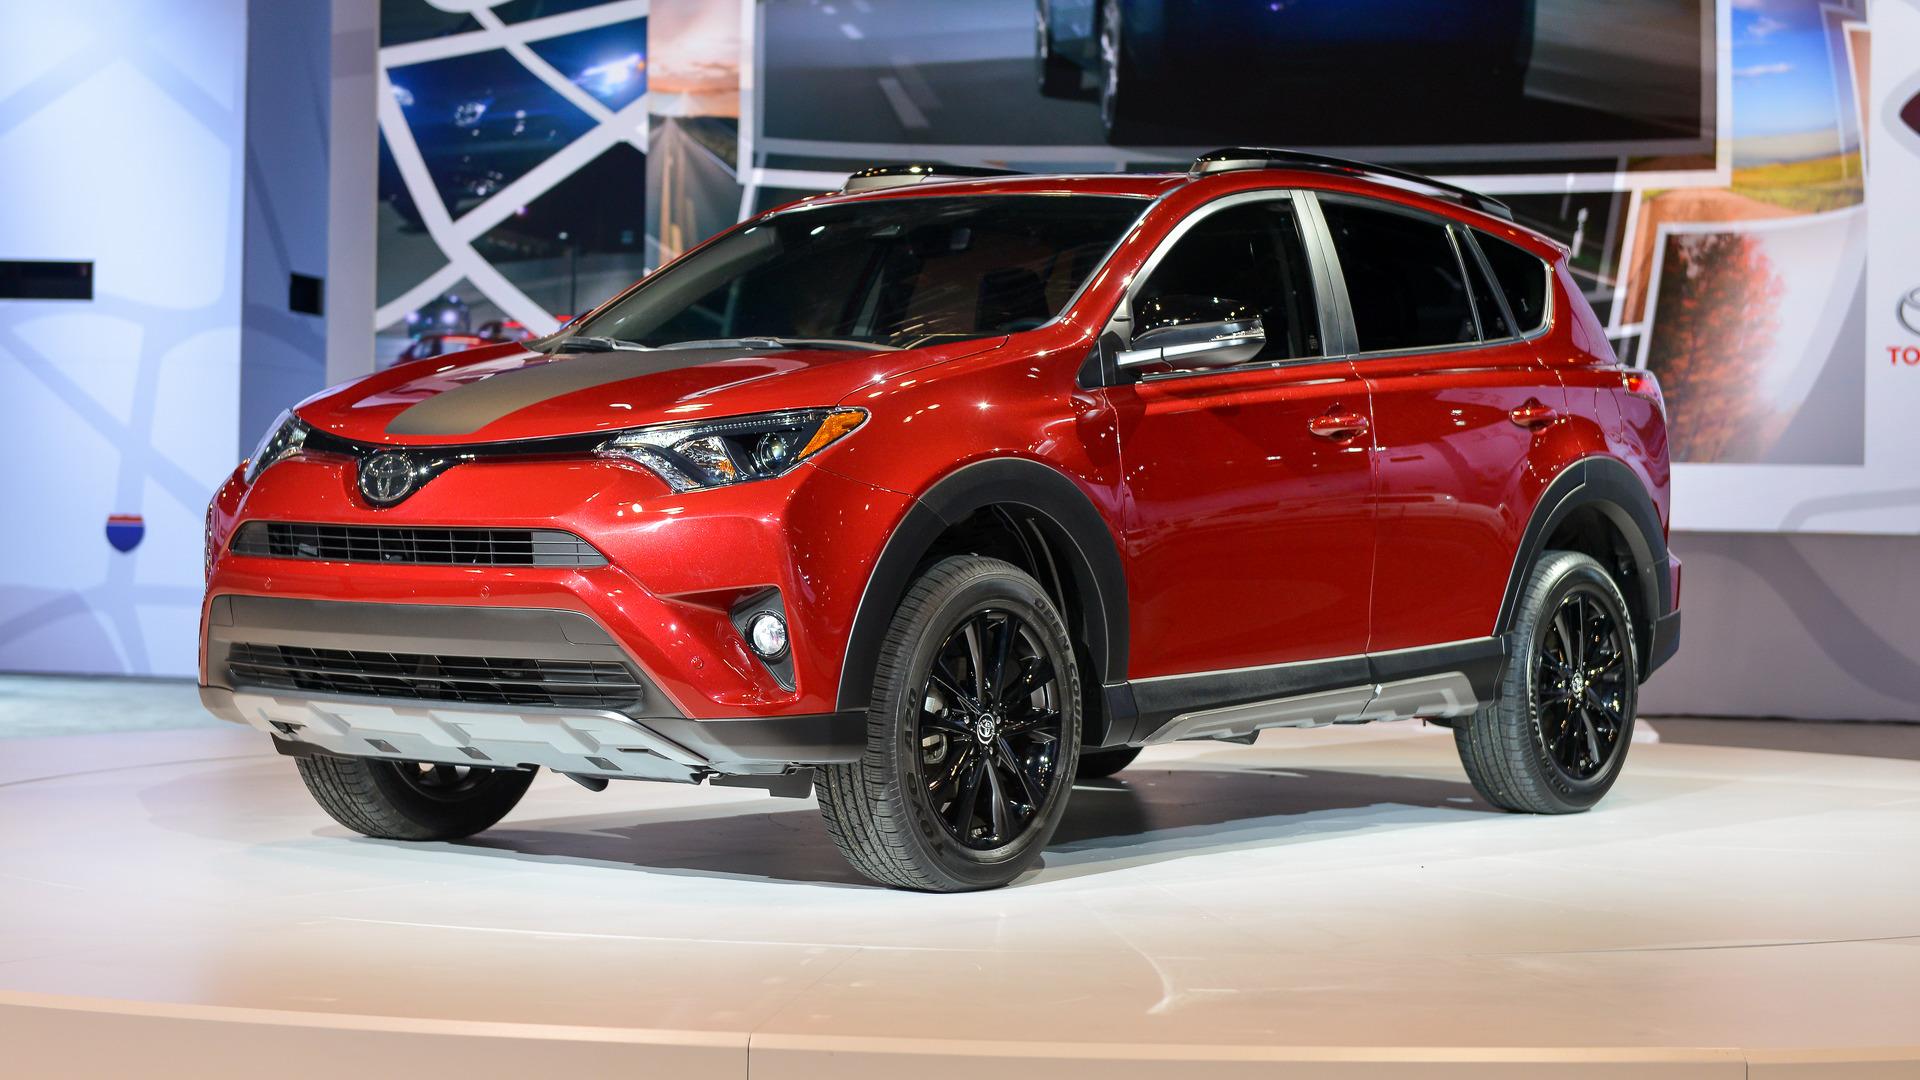 2018 Toyota RAV4: News, Features, Price >> 2018 Toyota Rav4 Adventure Gets A Price